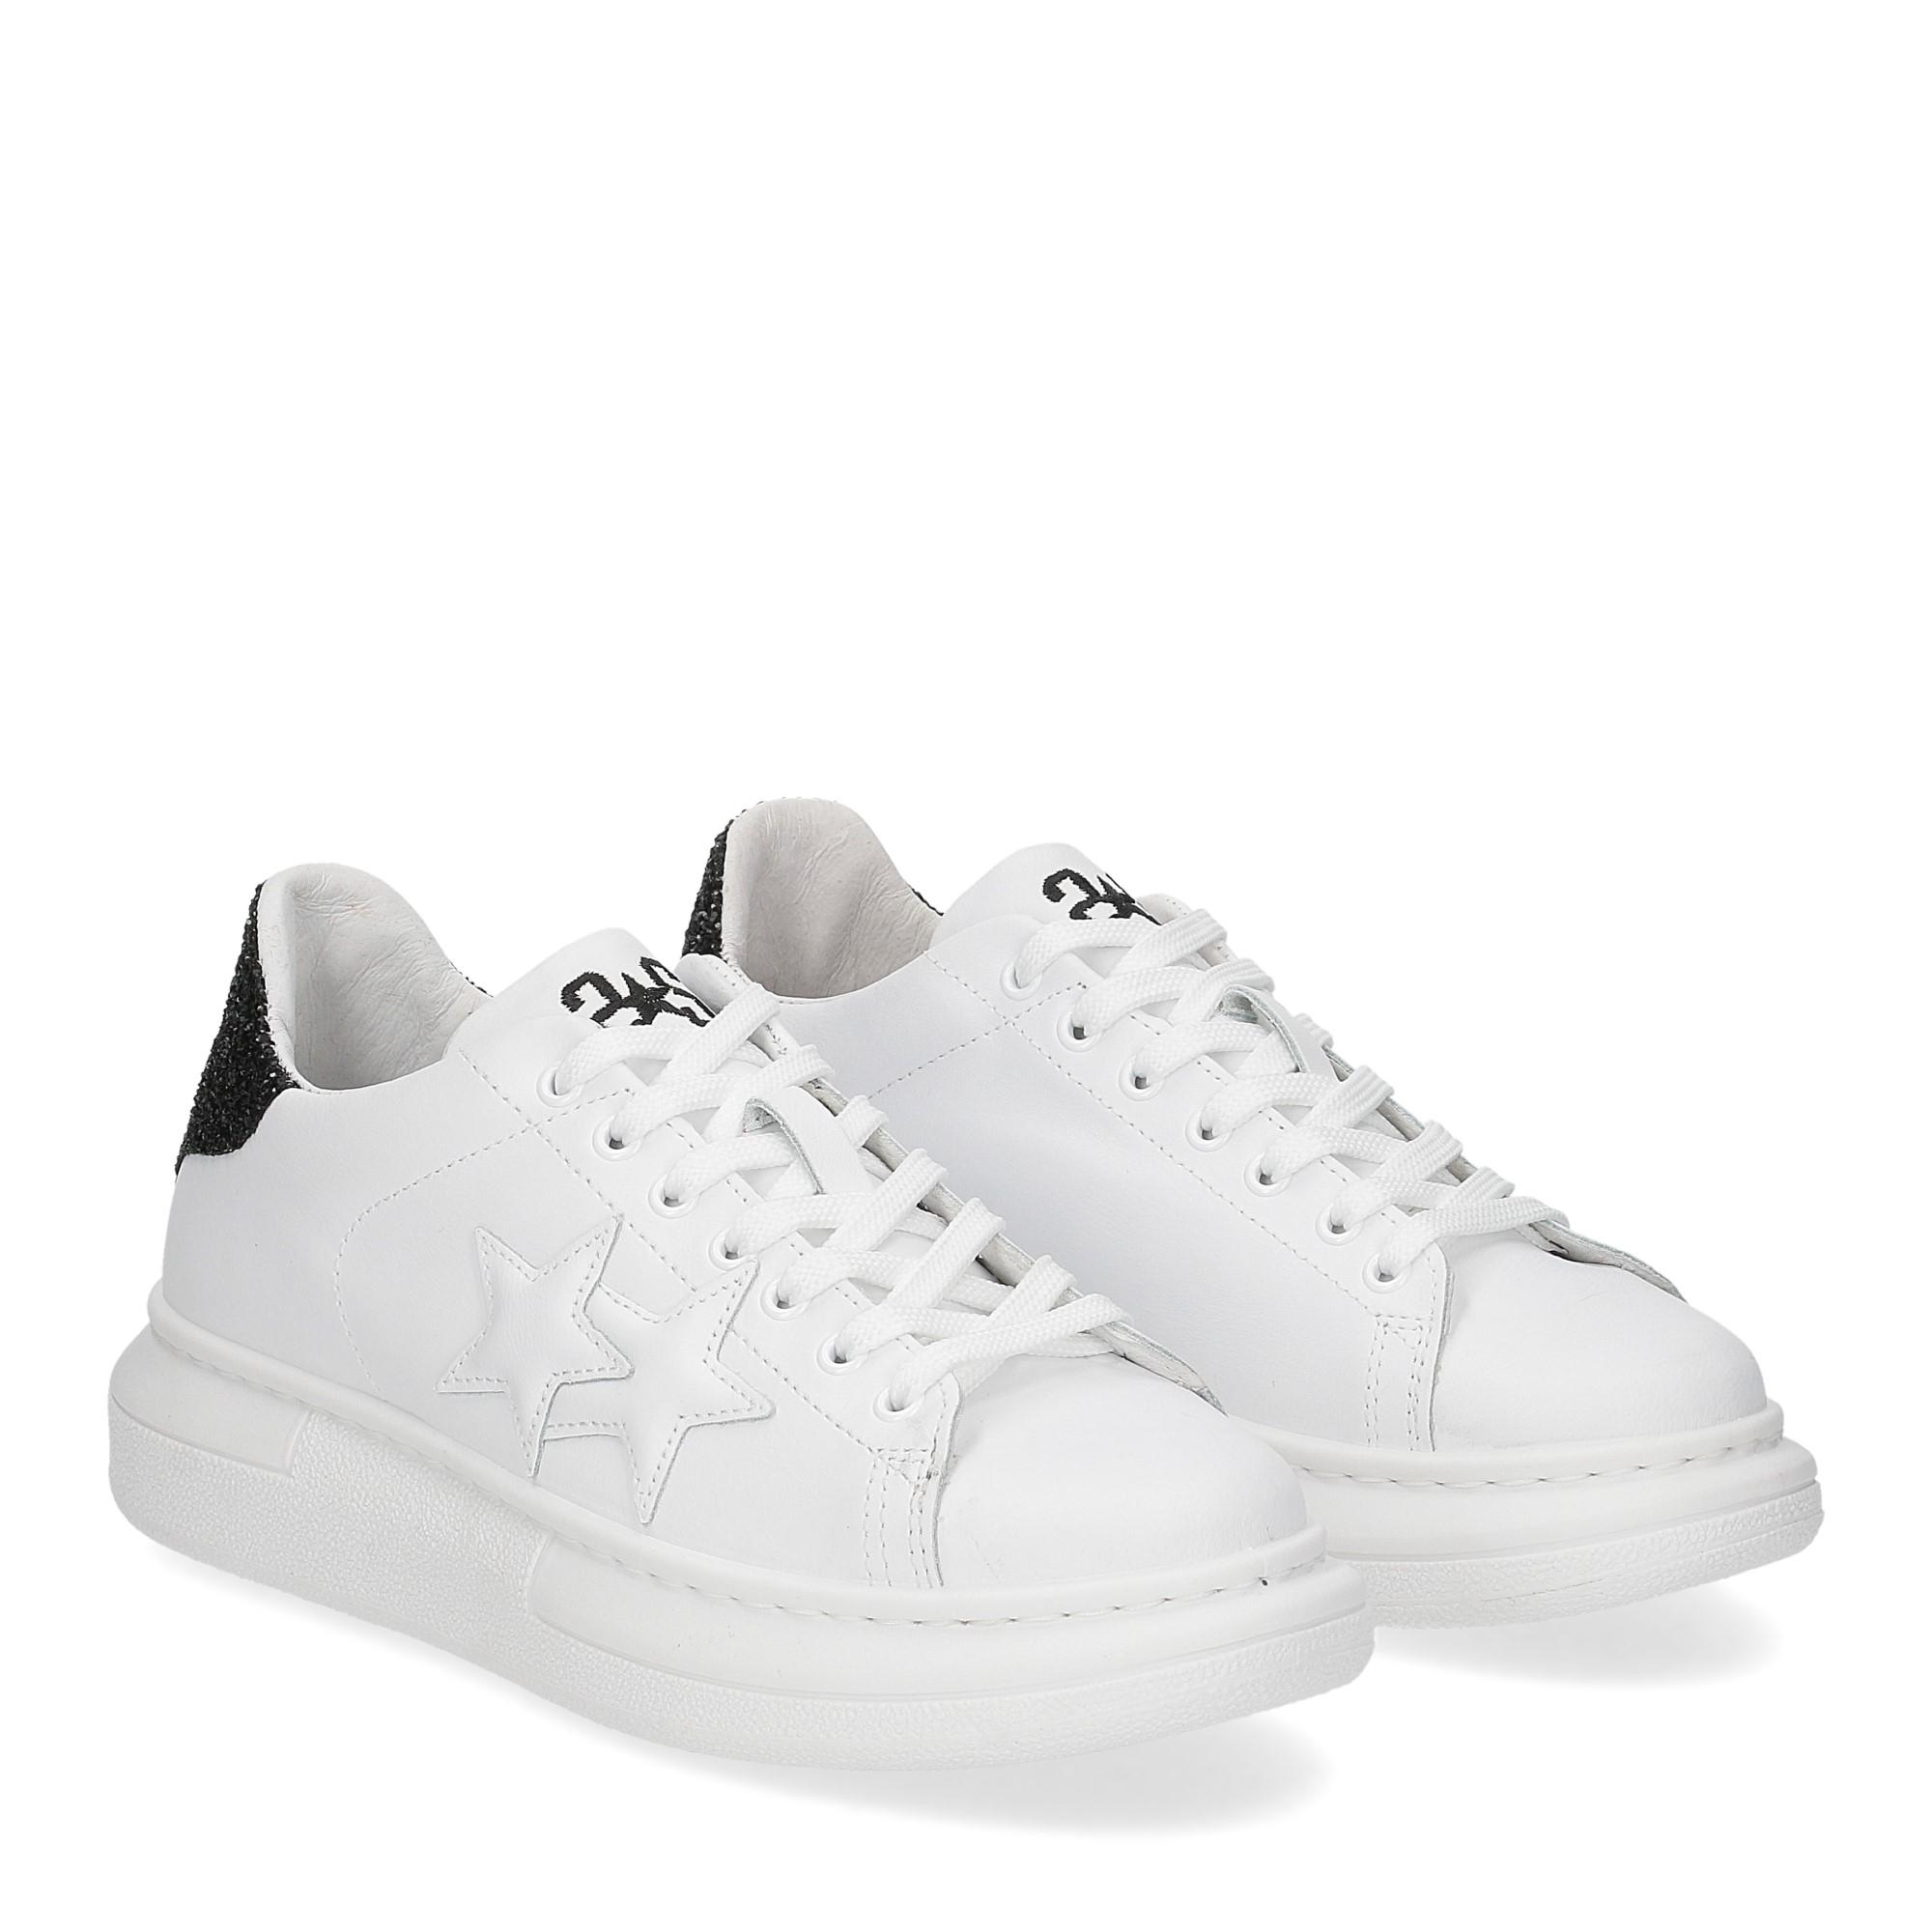 2Star 2885 sneaker bianco nero